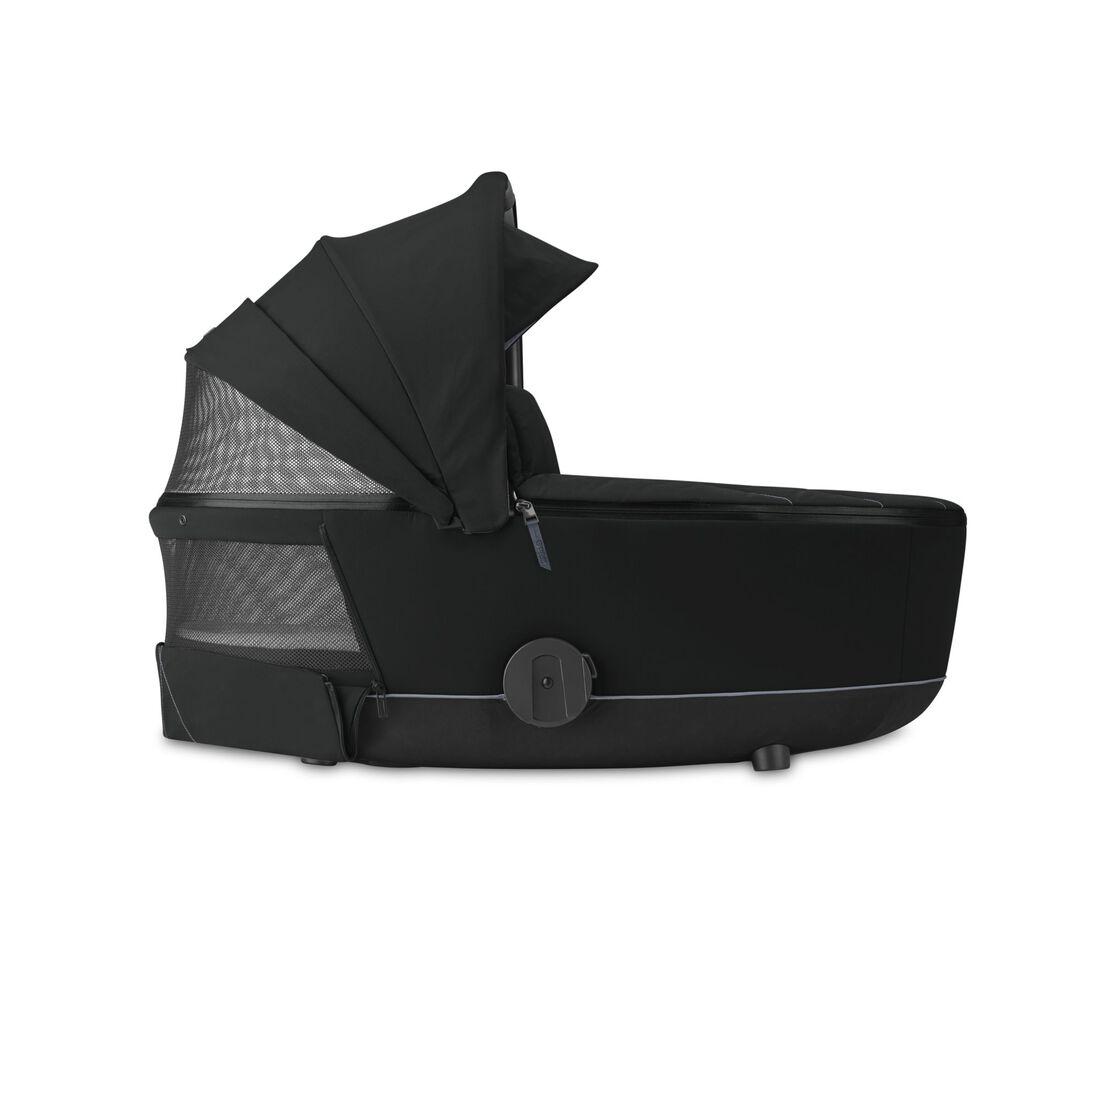 CYBEX Mios Lux Carry Cot - Deep Black in Deep Black large Bild 3